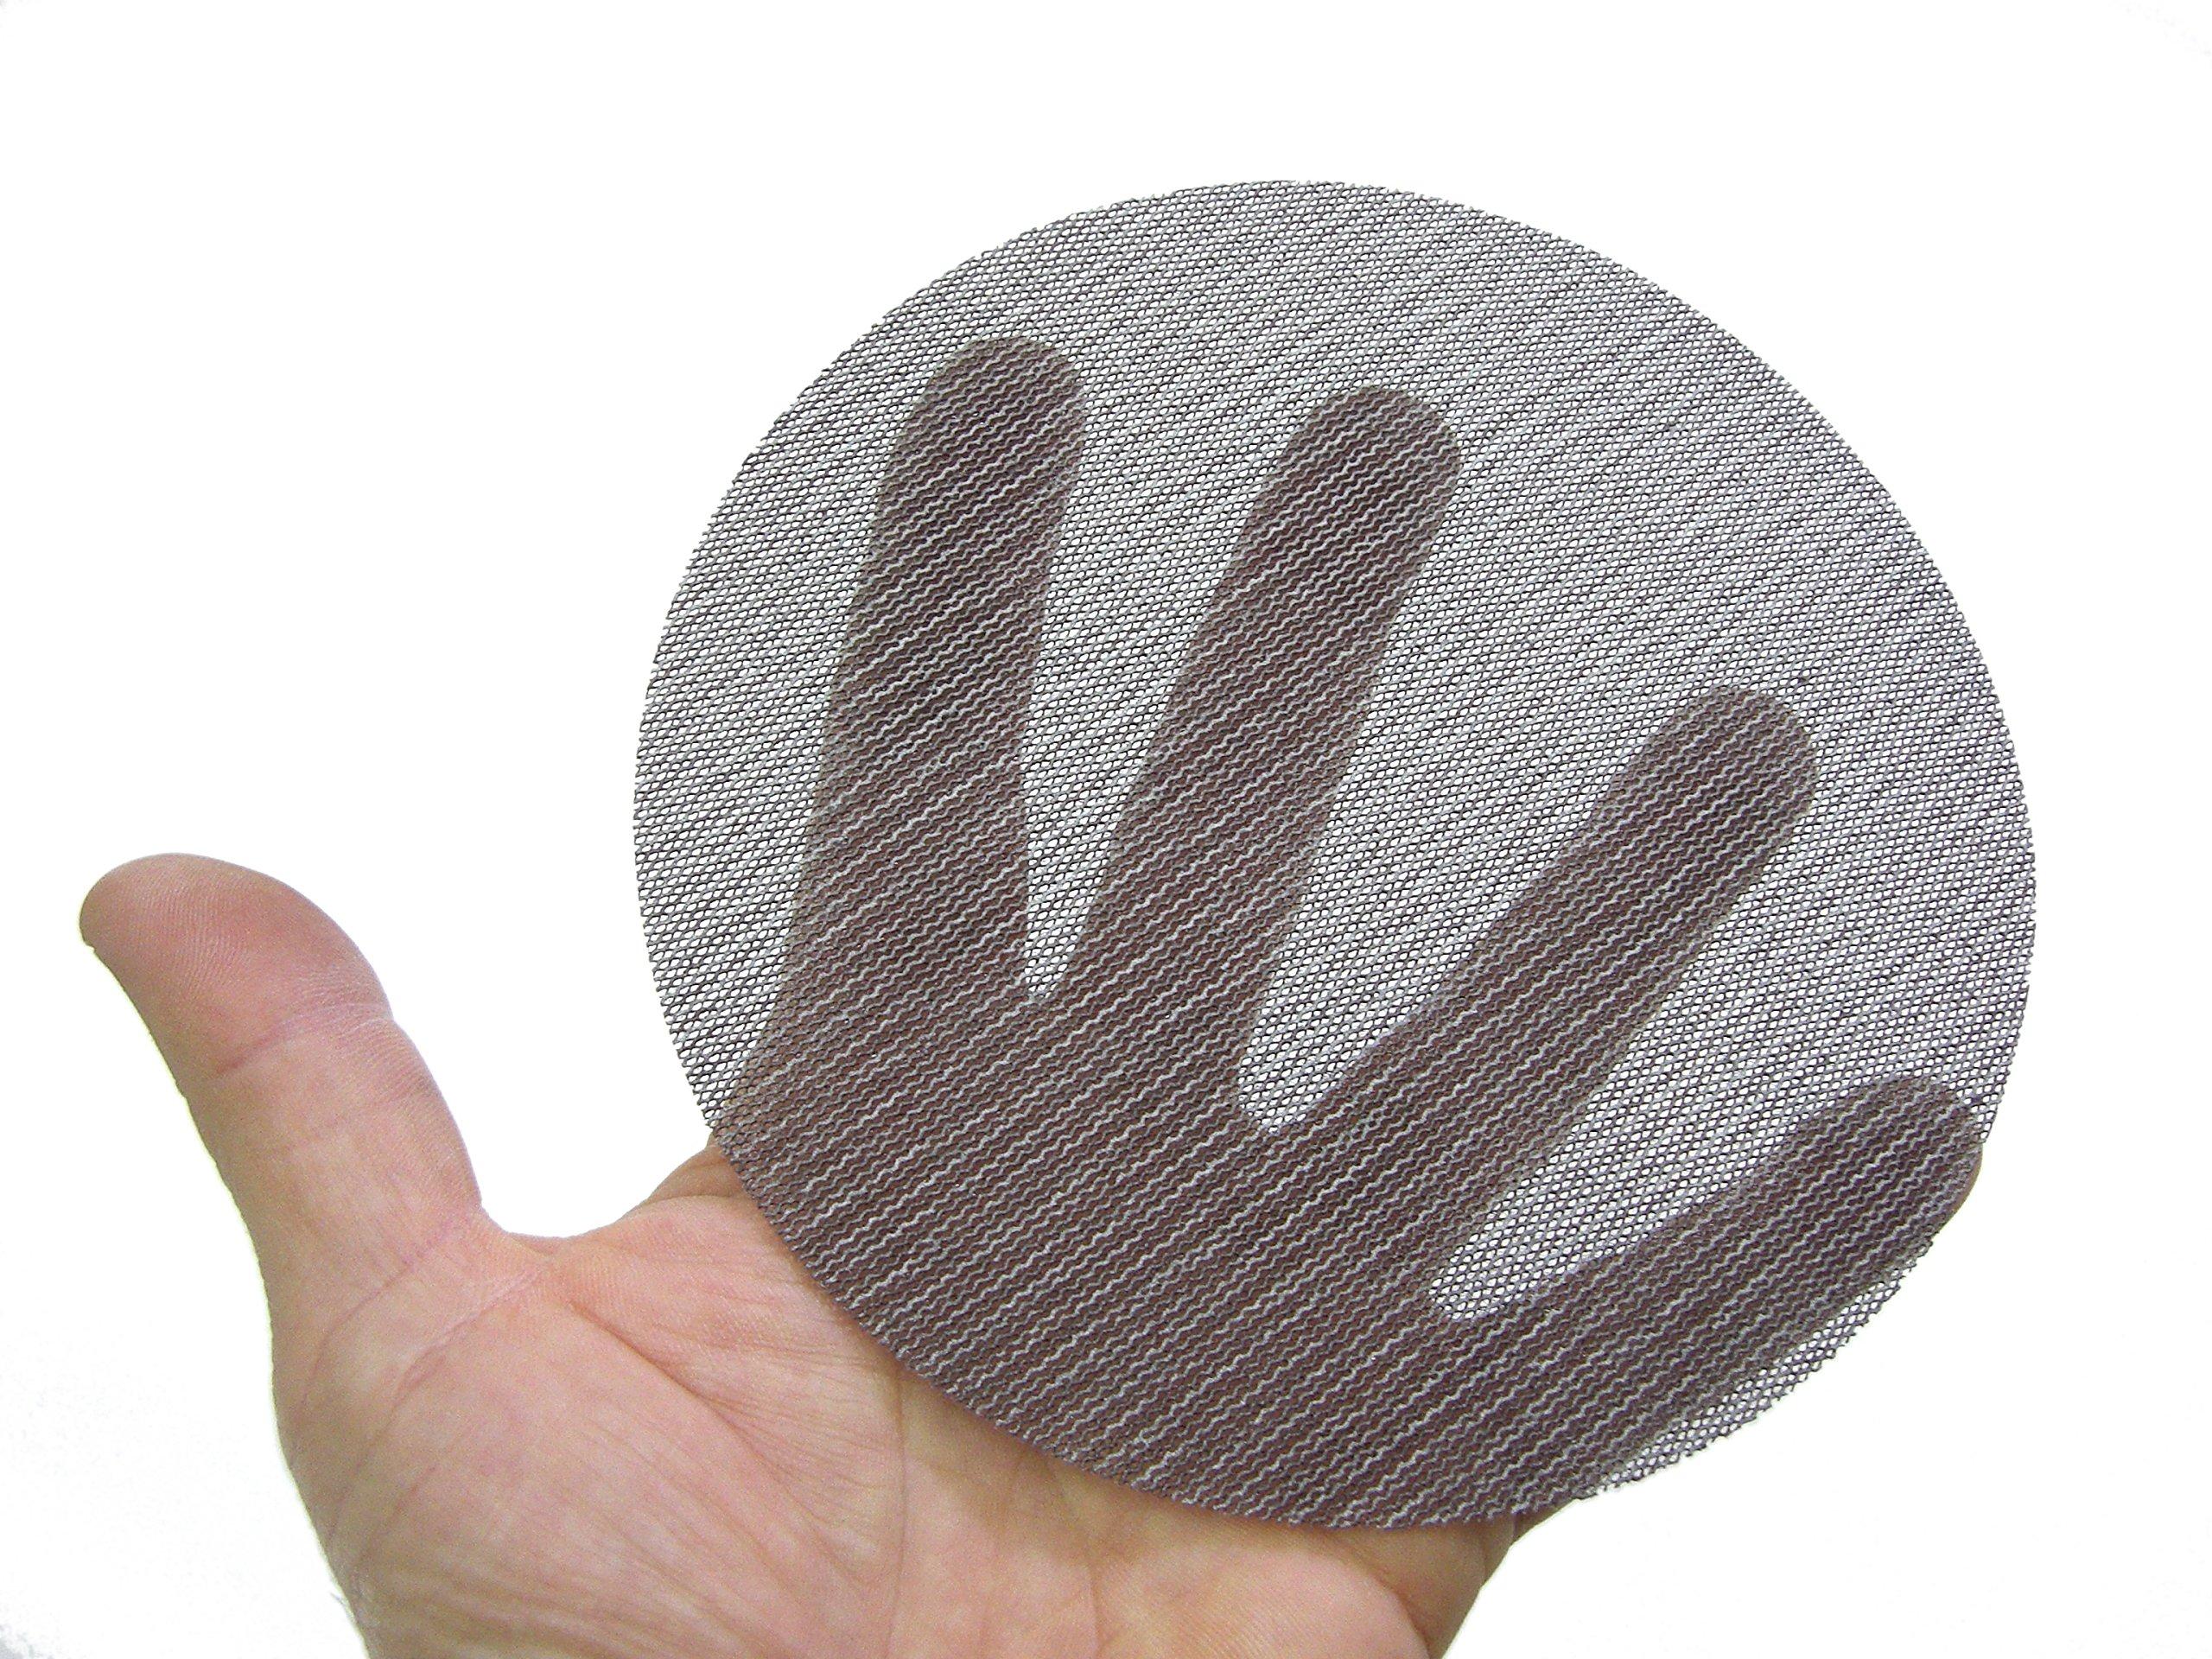 Mirka 9A-232-320 Abranet 5'' 320 Grit Mesh Abrasive Dust Free Sanding Discs (Box of 50 Discs) by Mirka (Image #2)